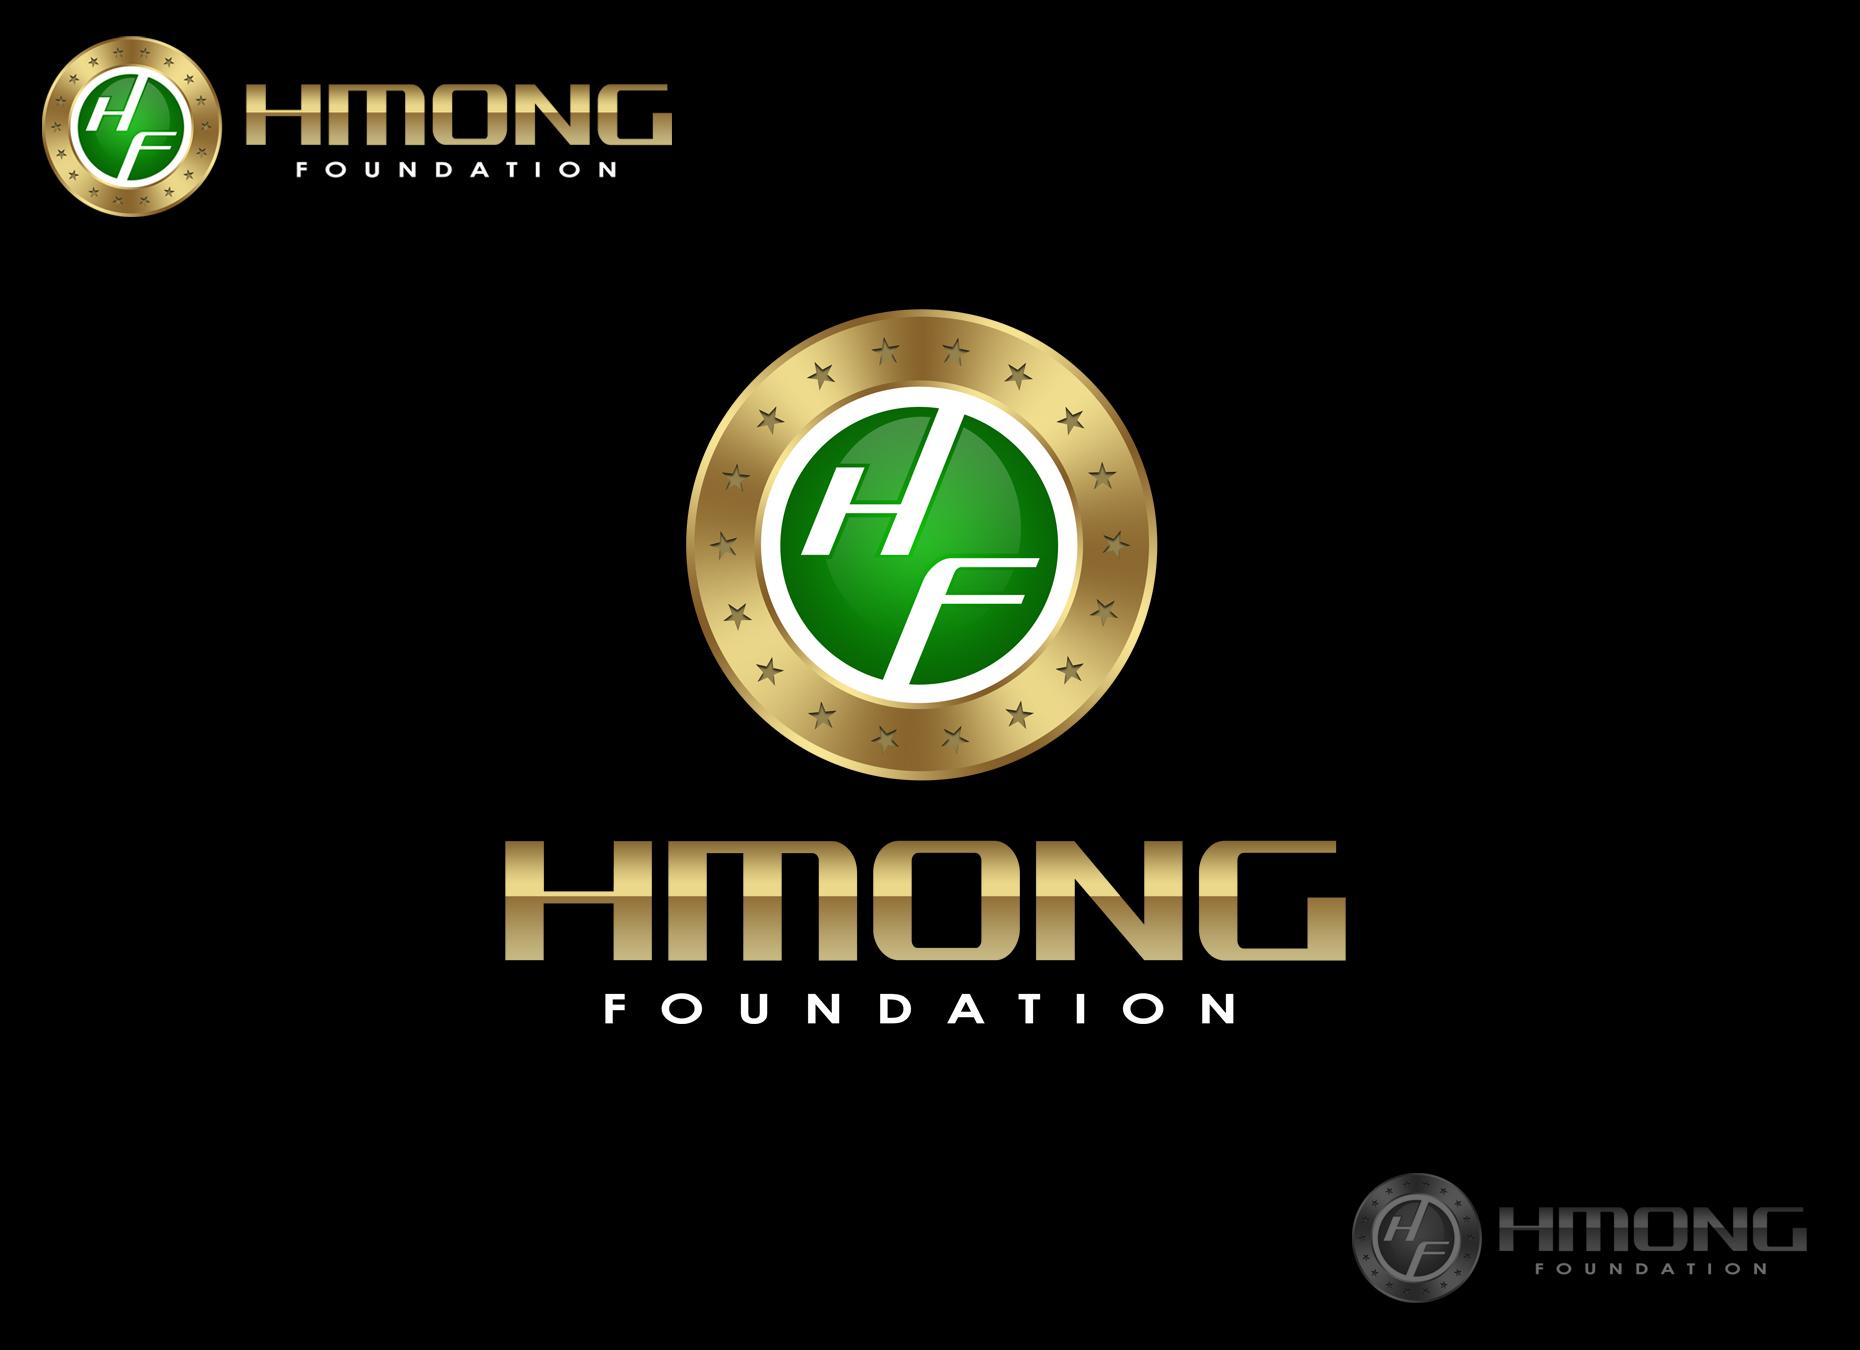 Logo Design by omARTist - Entry No. 97 in the Logo Design Contest Fun Logo Design for Hmong Foundation.